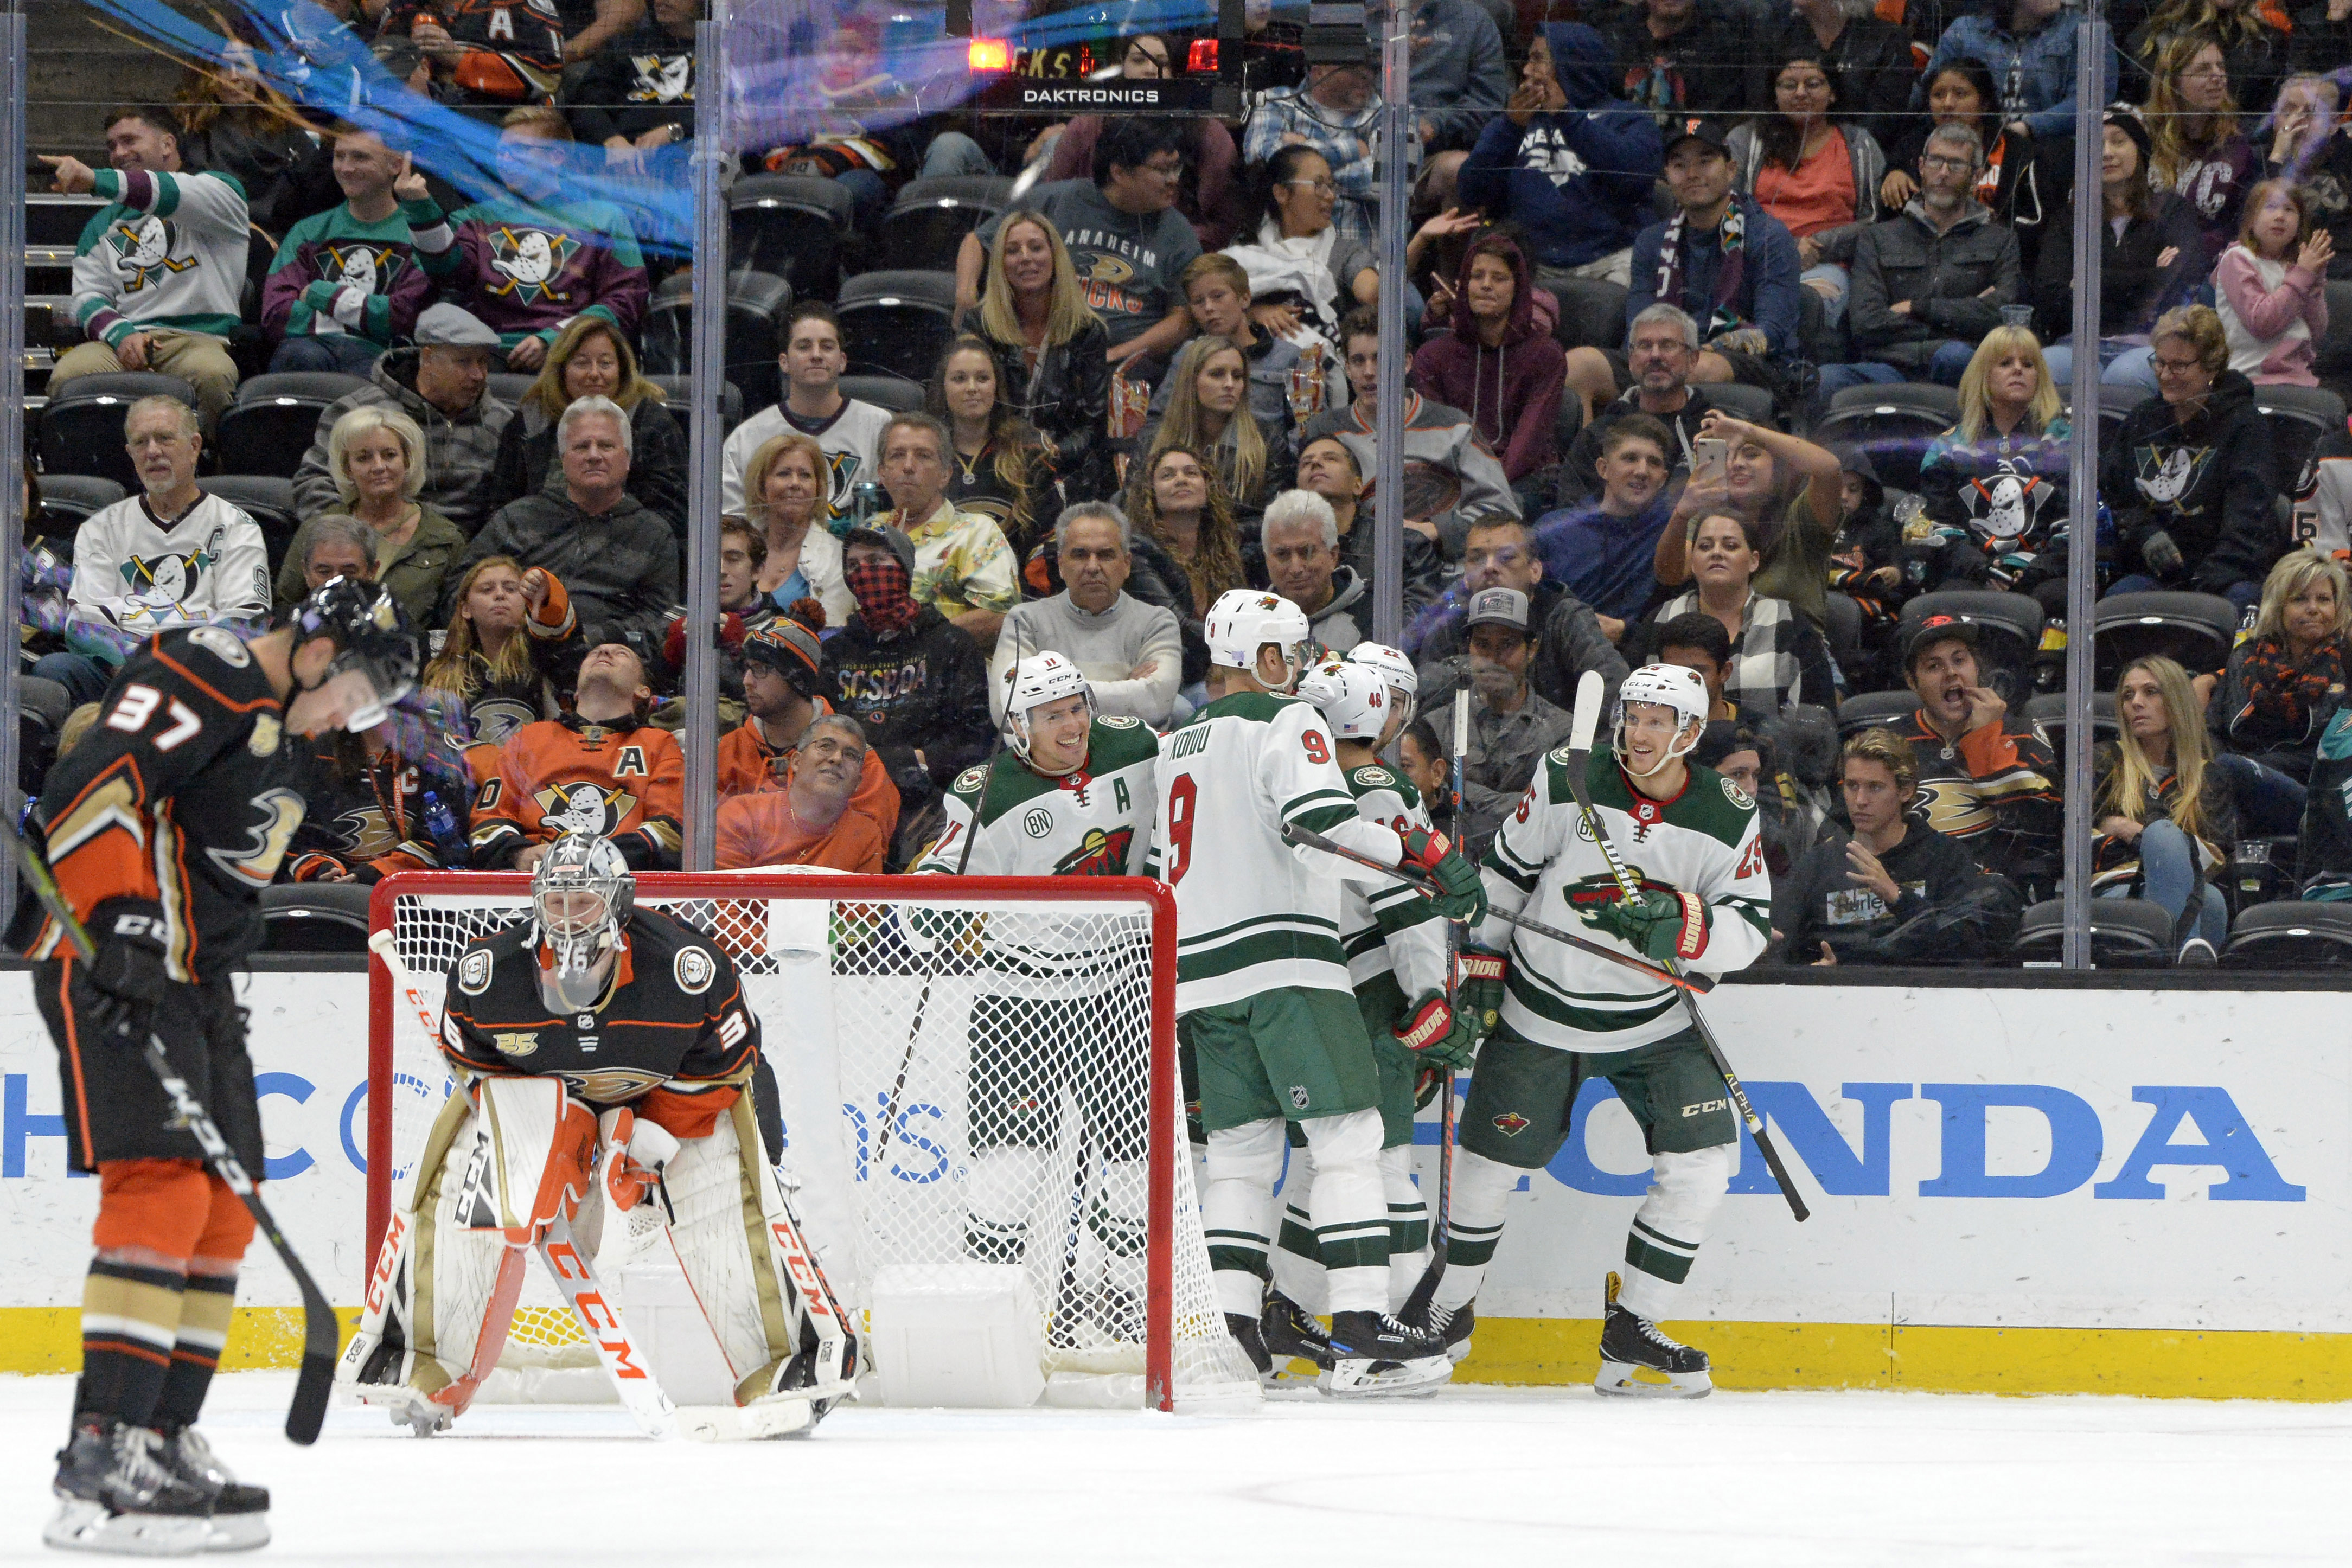 Four Unanswered Goals Lift Wild to 4-2 Win over Anaheim